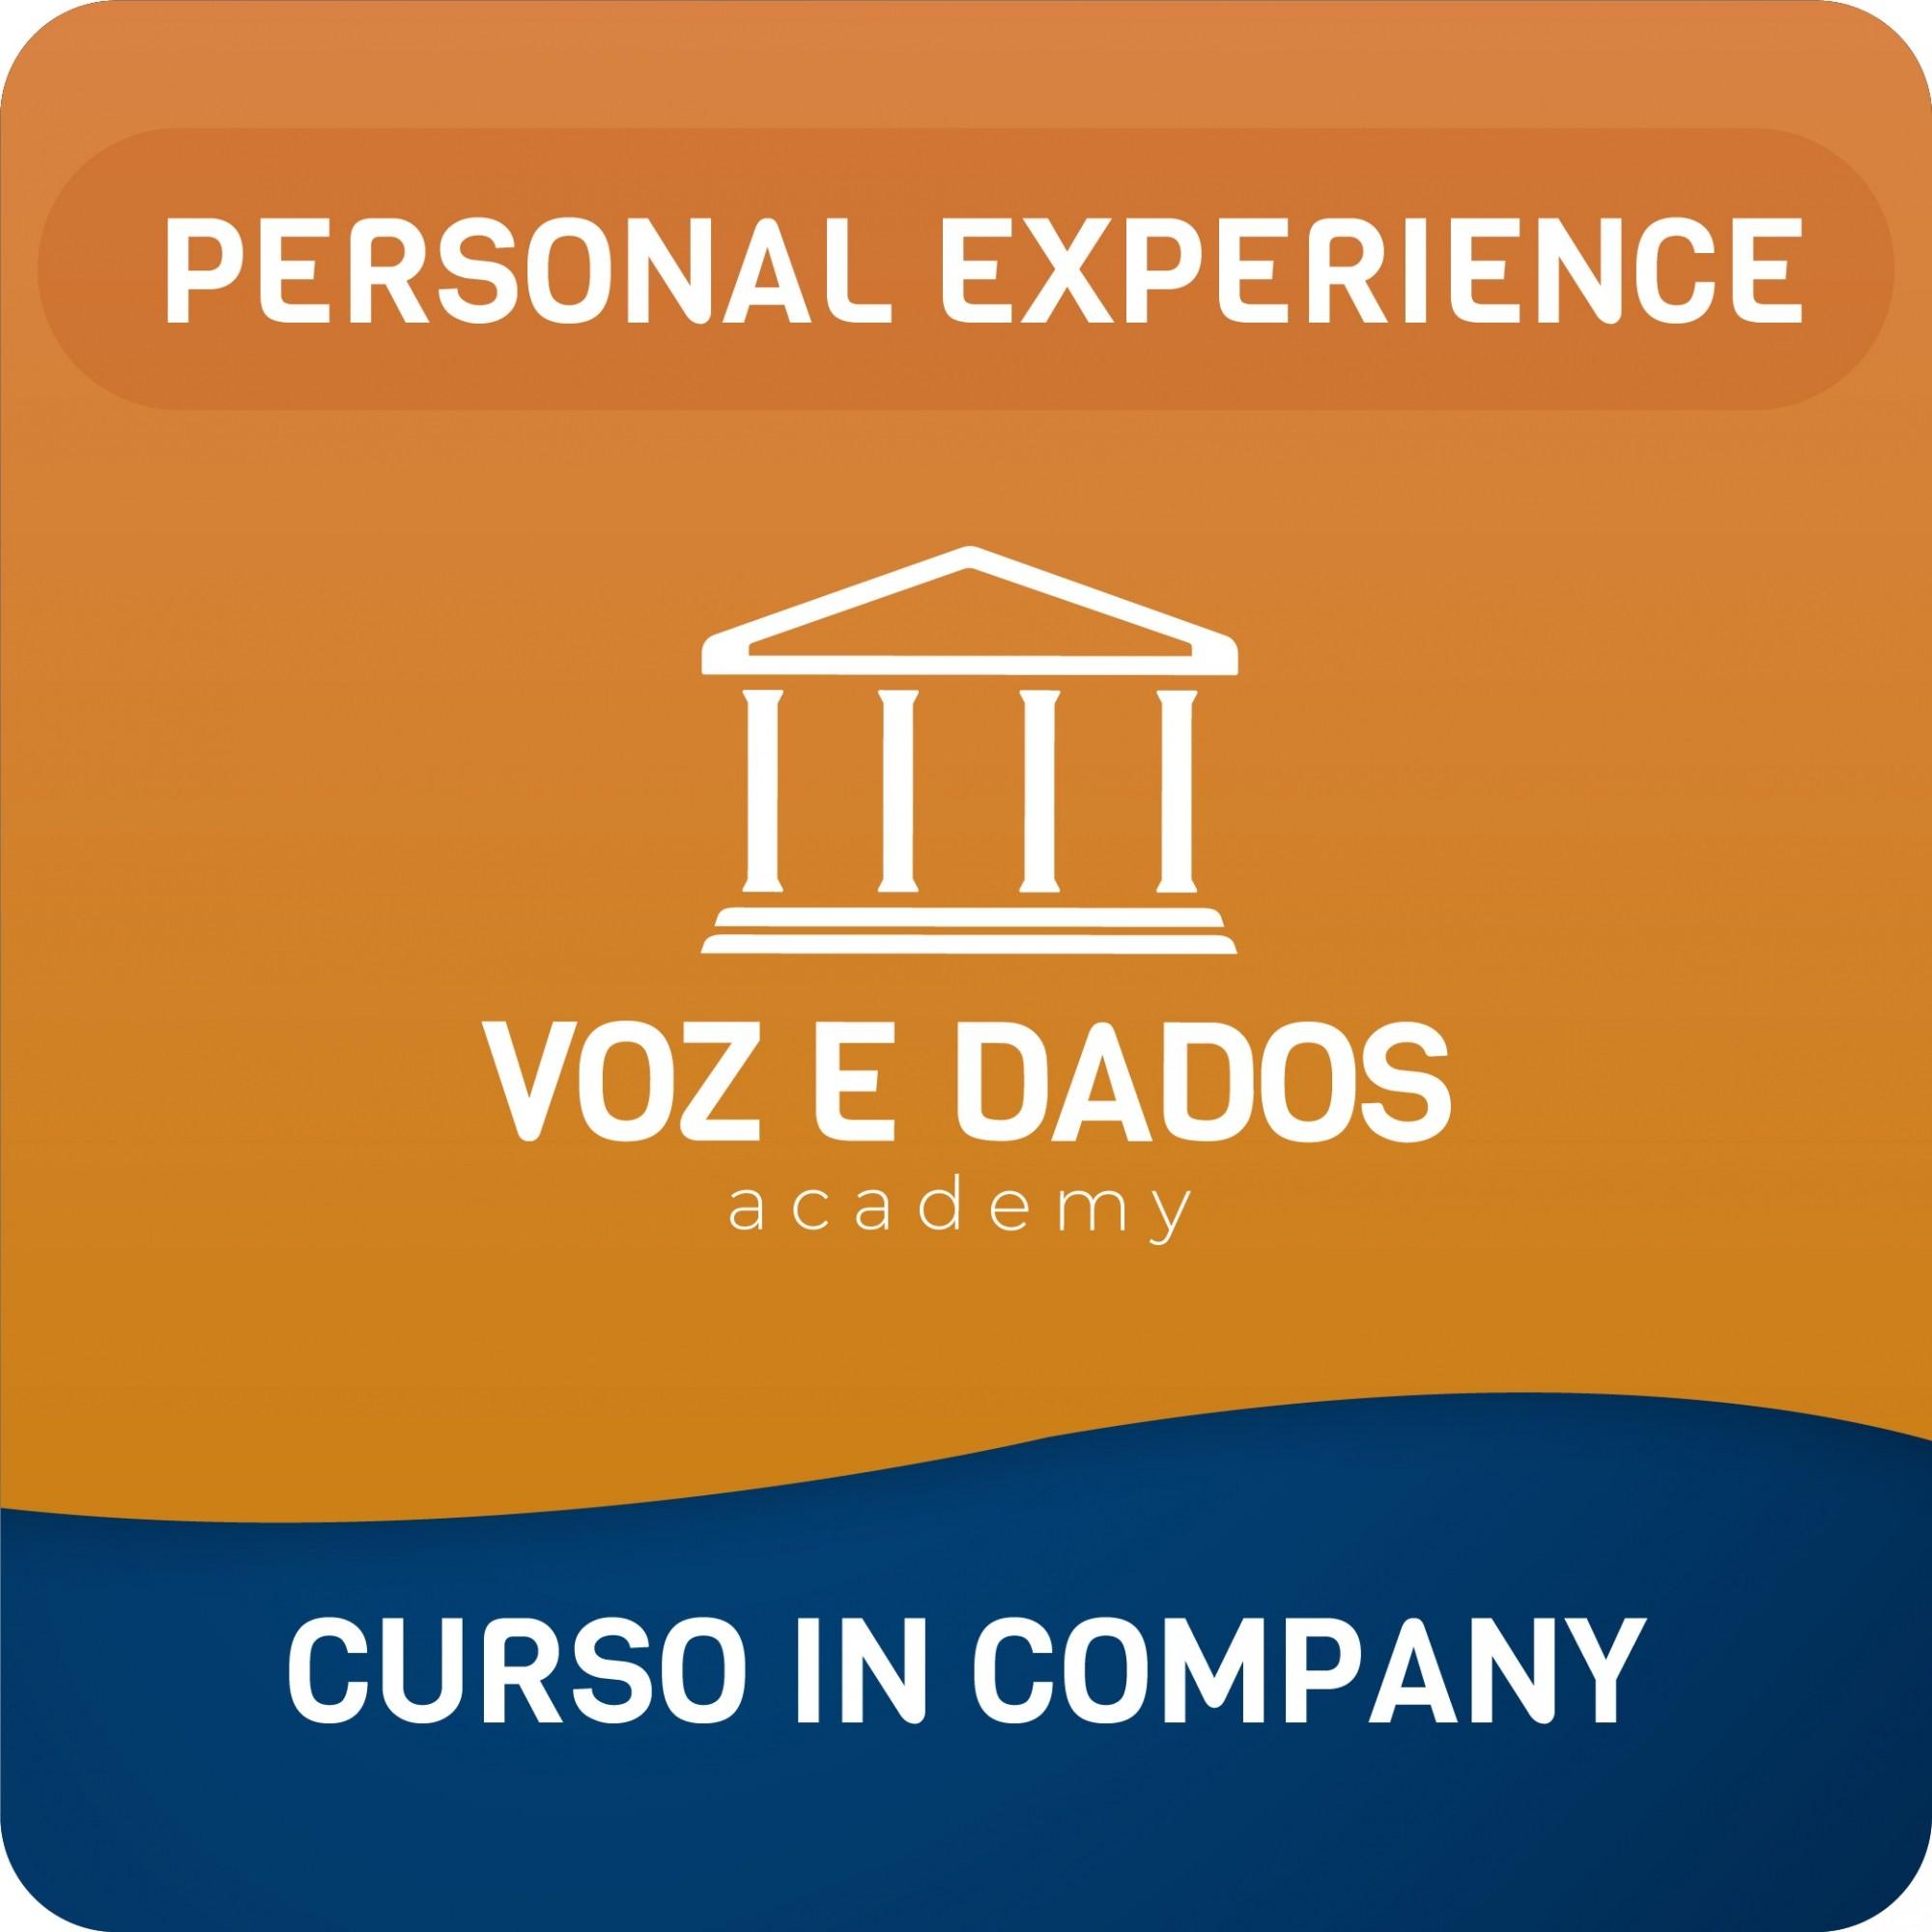 Personal Experience  - Voz e Dados